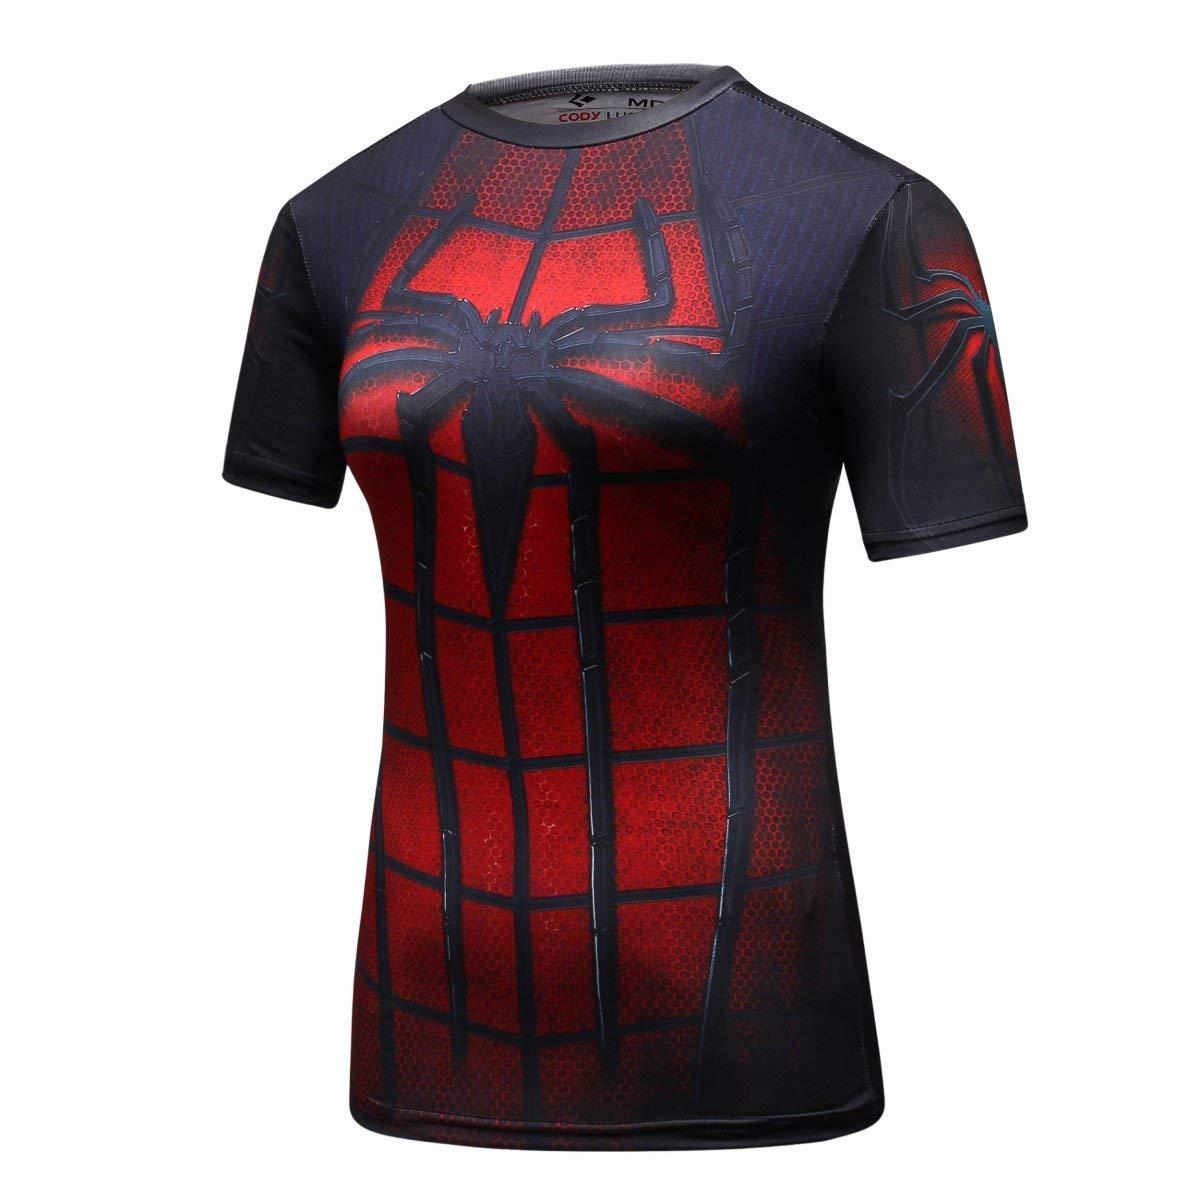 Women's Spiderman Compression Tee Shirt